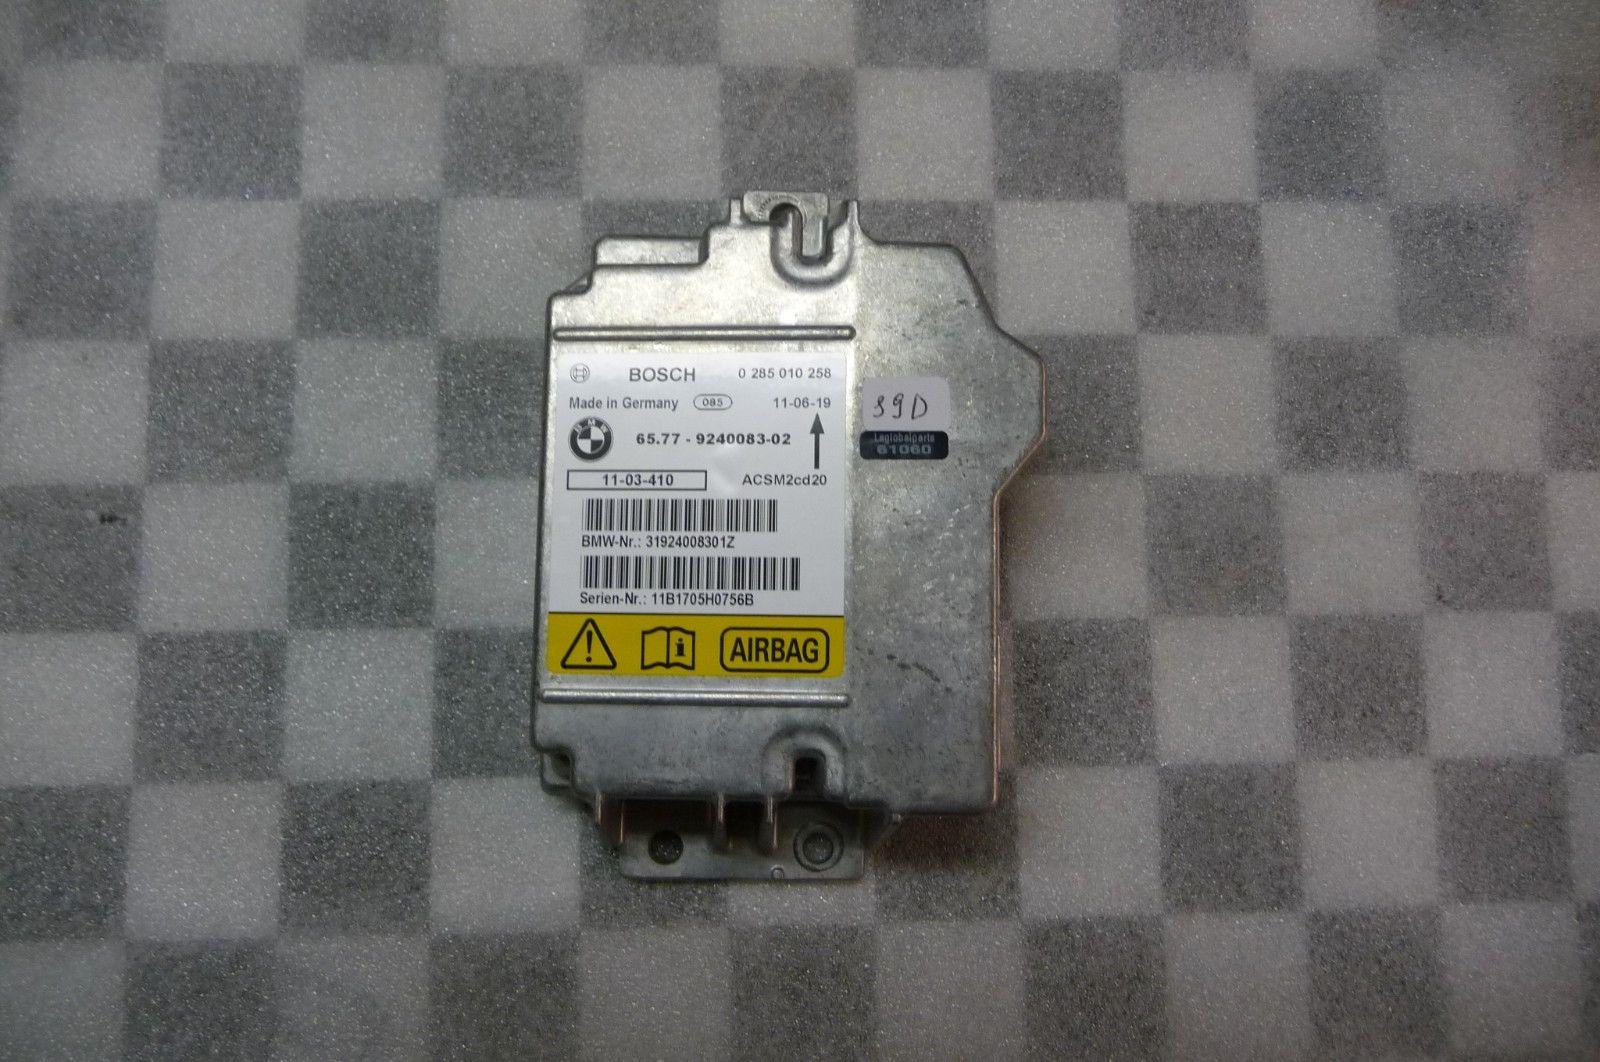 BMW 1 Series X1 X5 X6 Airbag Control Unit BOSCH 65779240083 OEM OE